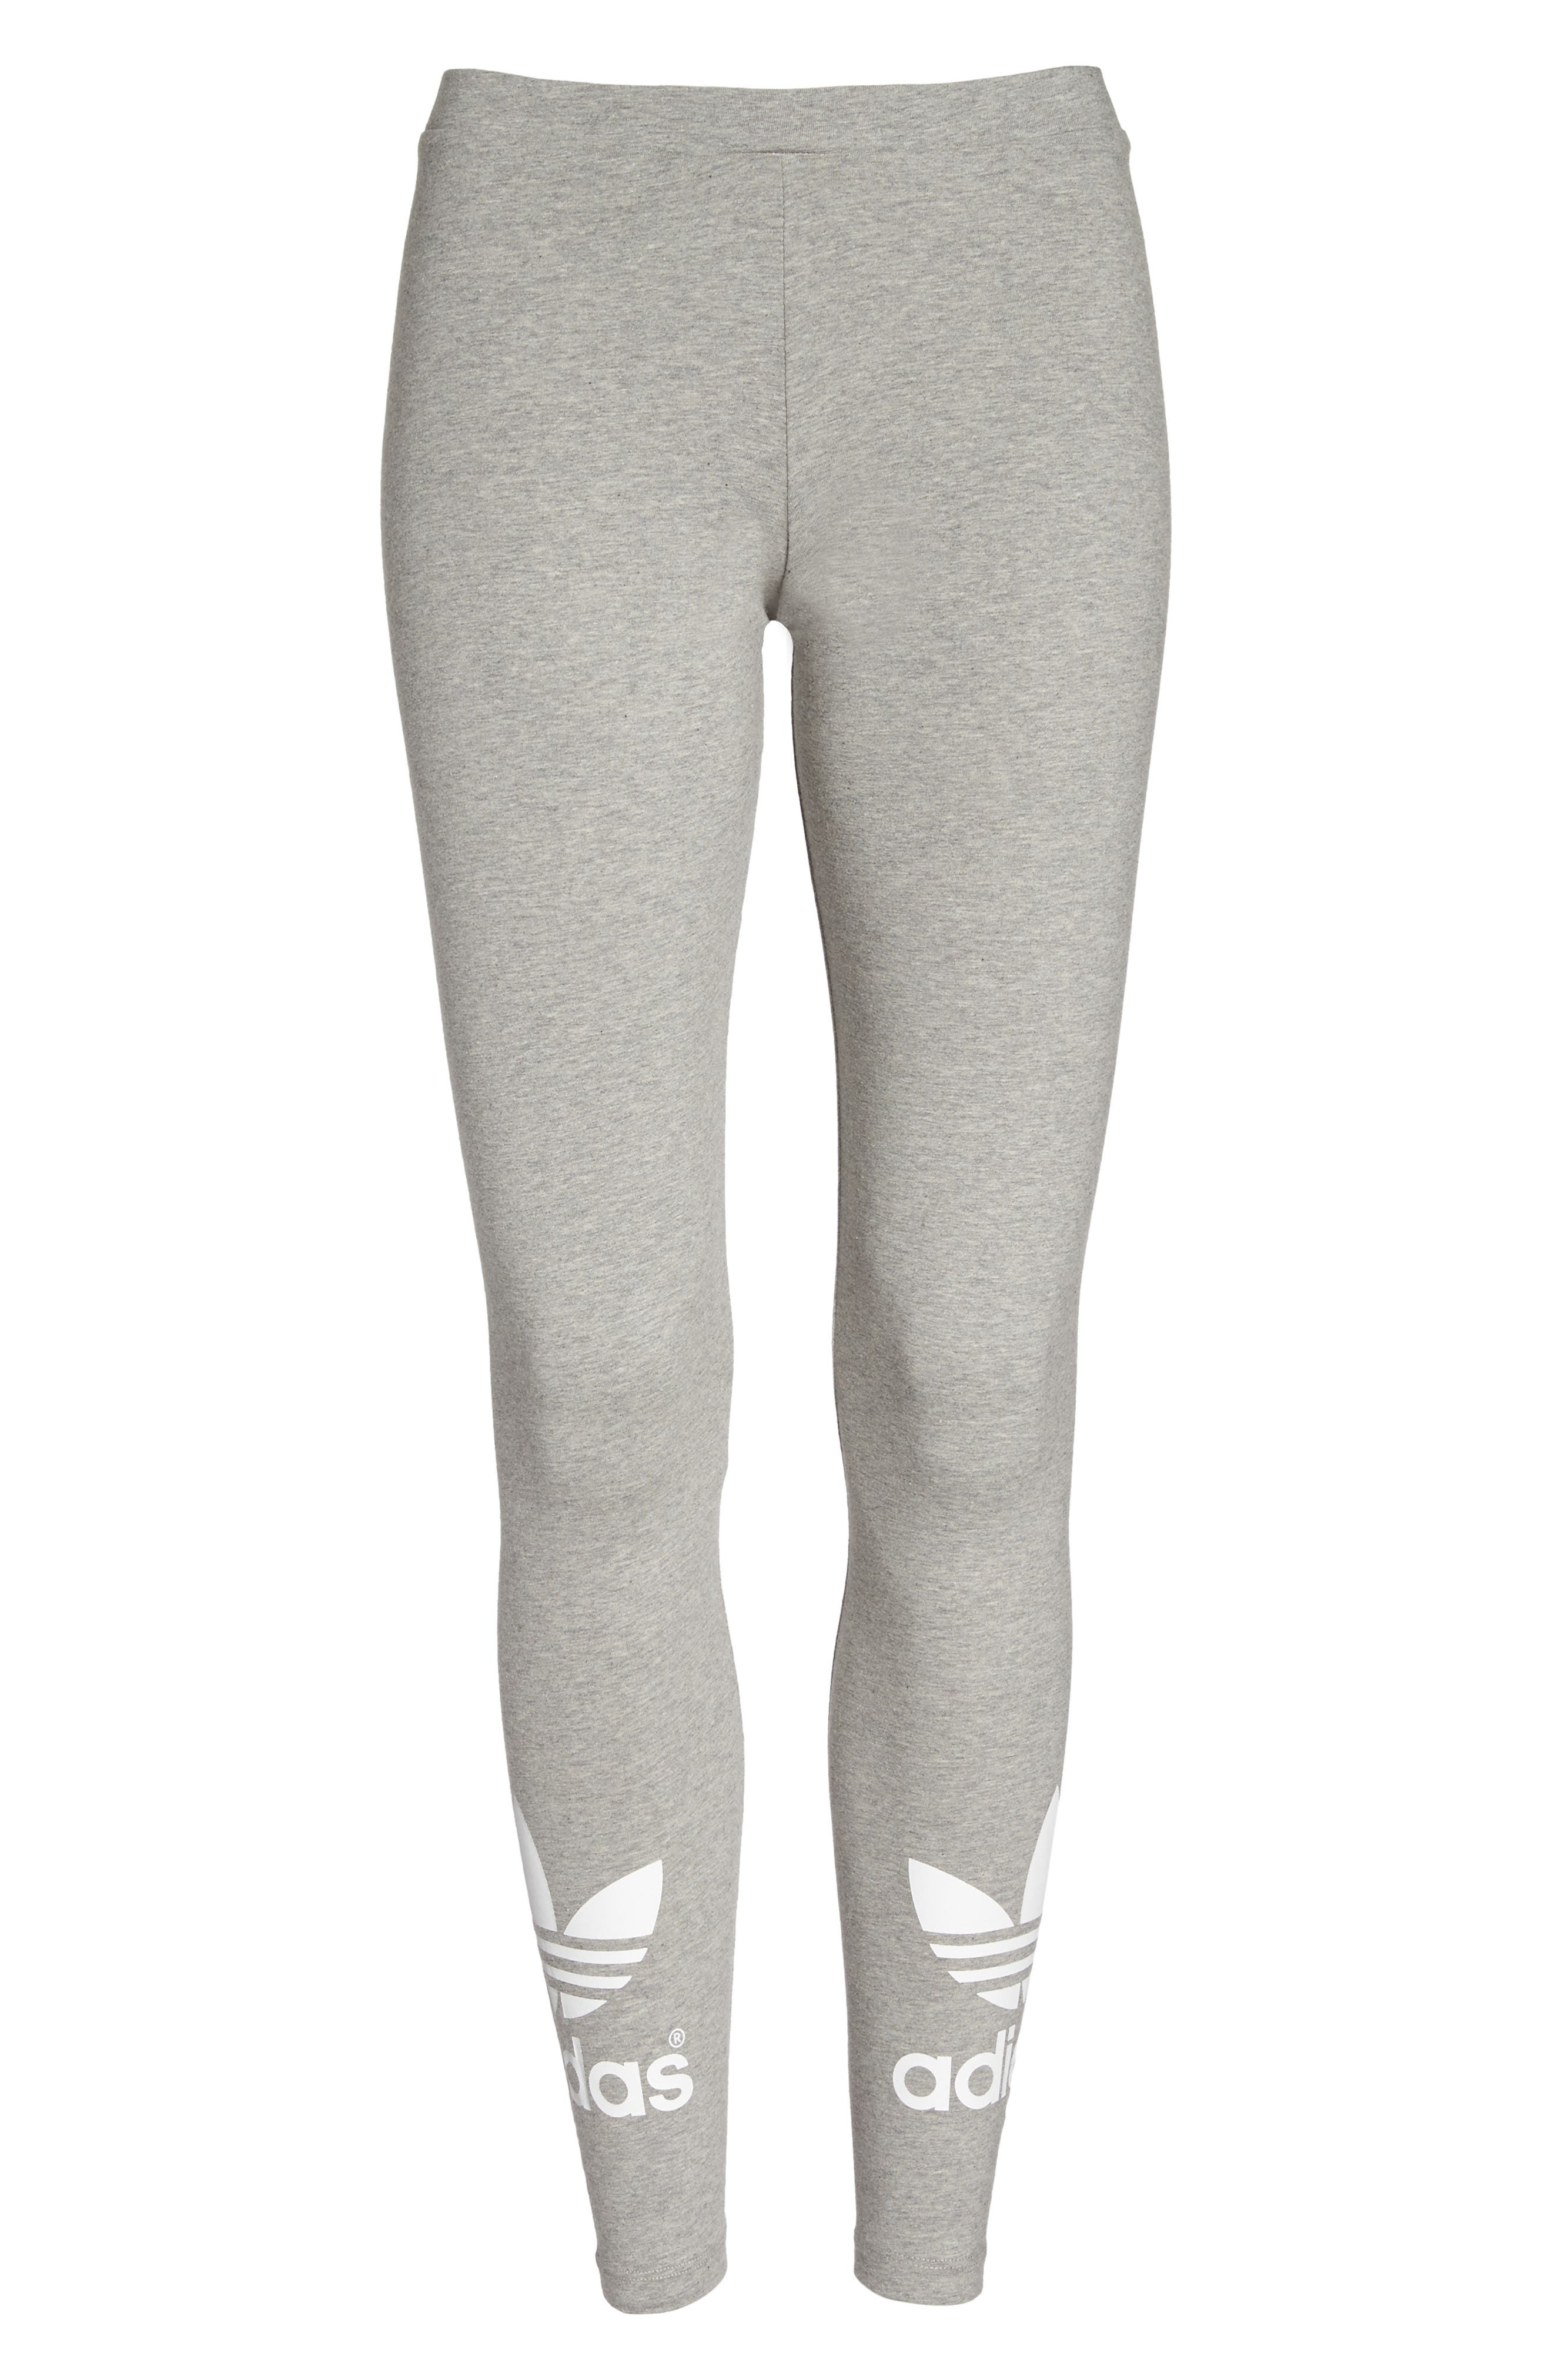 Originals Logo Leggings,                         Main,                         color, Medium Grey Heather